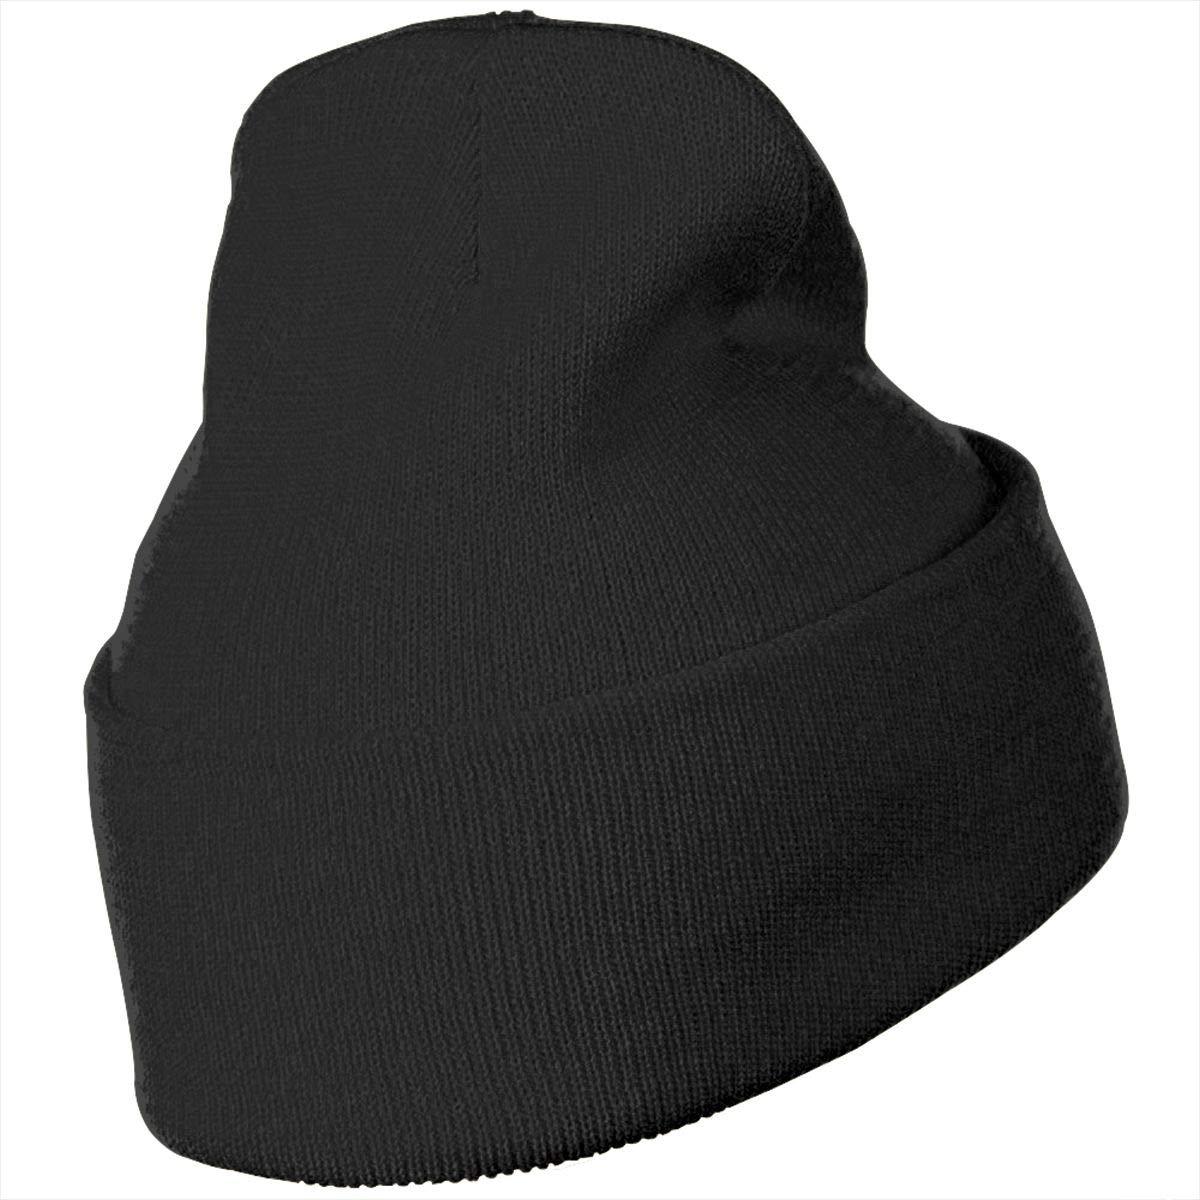 SLADDD1 ATCQ Warm Winter Hat Knit Beanie Skull Cap Cuff Beanie Hat Winter Hats for Men /& Women